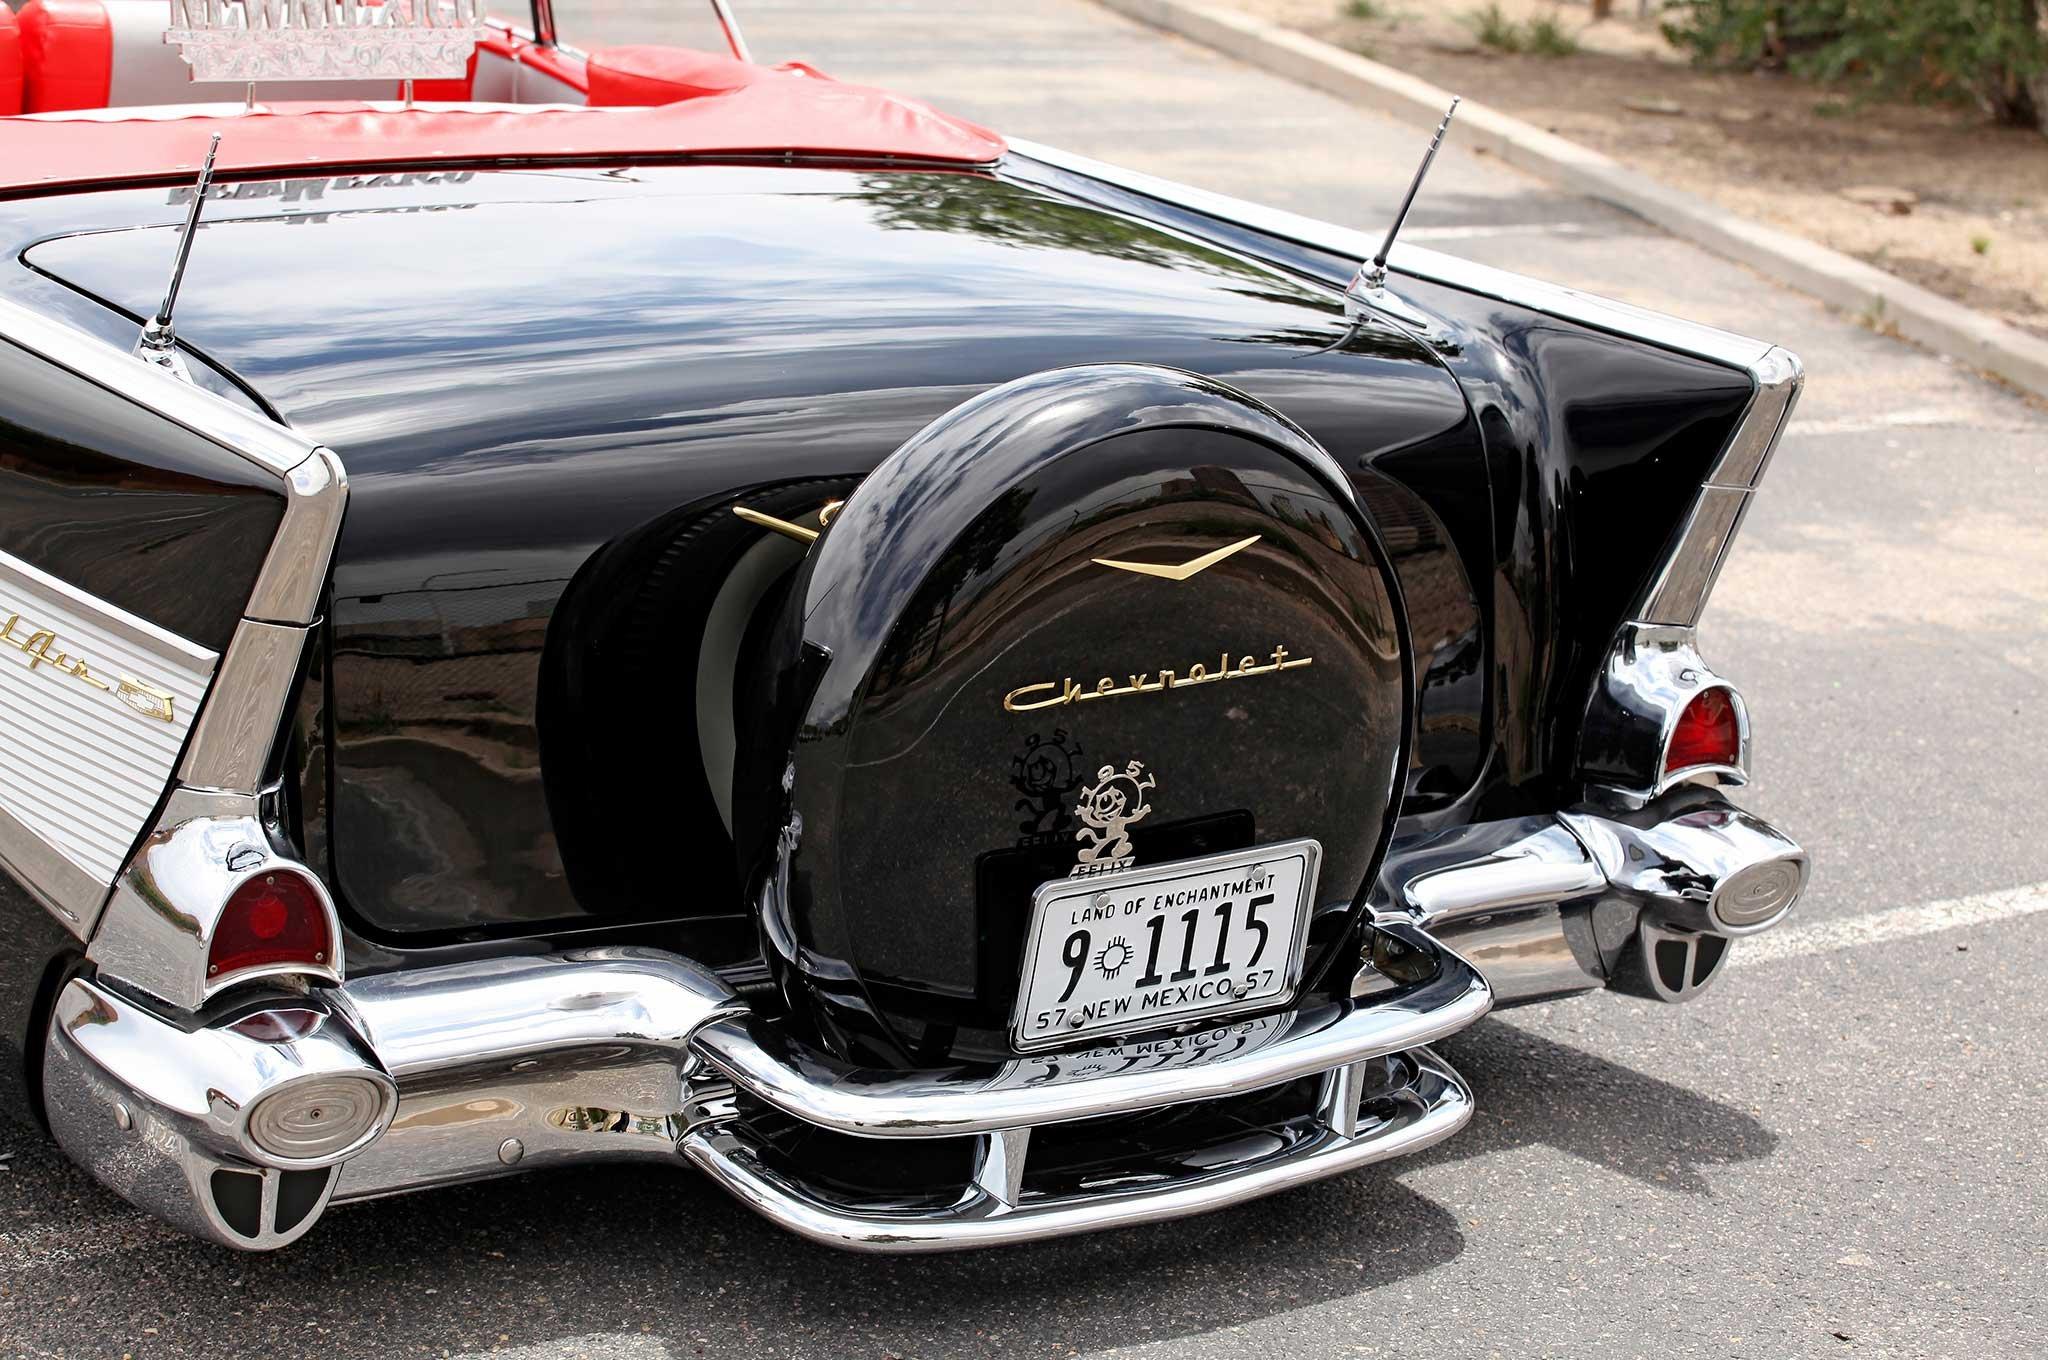 1957 Chevy Bel Air Convertible Custom Tuning Hot Rods Rod Gangsta Lowrider Wallpaper 2048x1360 971406 Wallpaperup